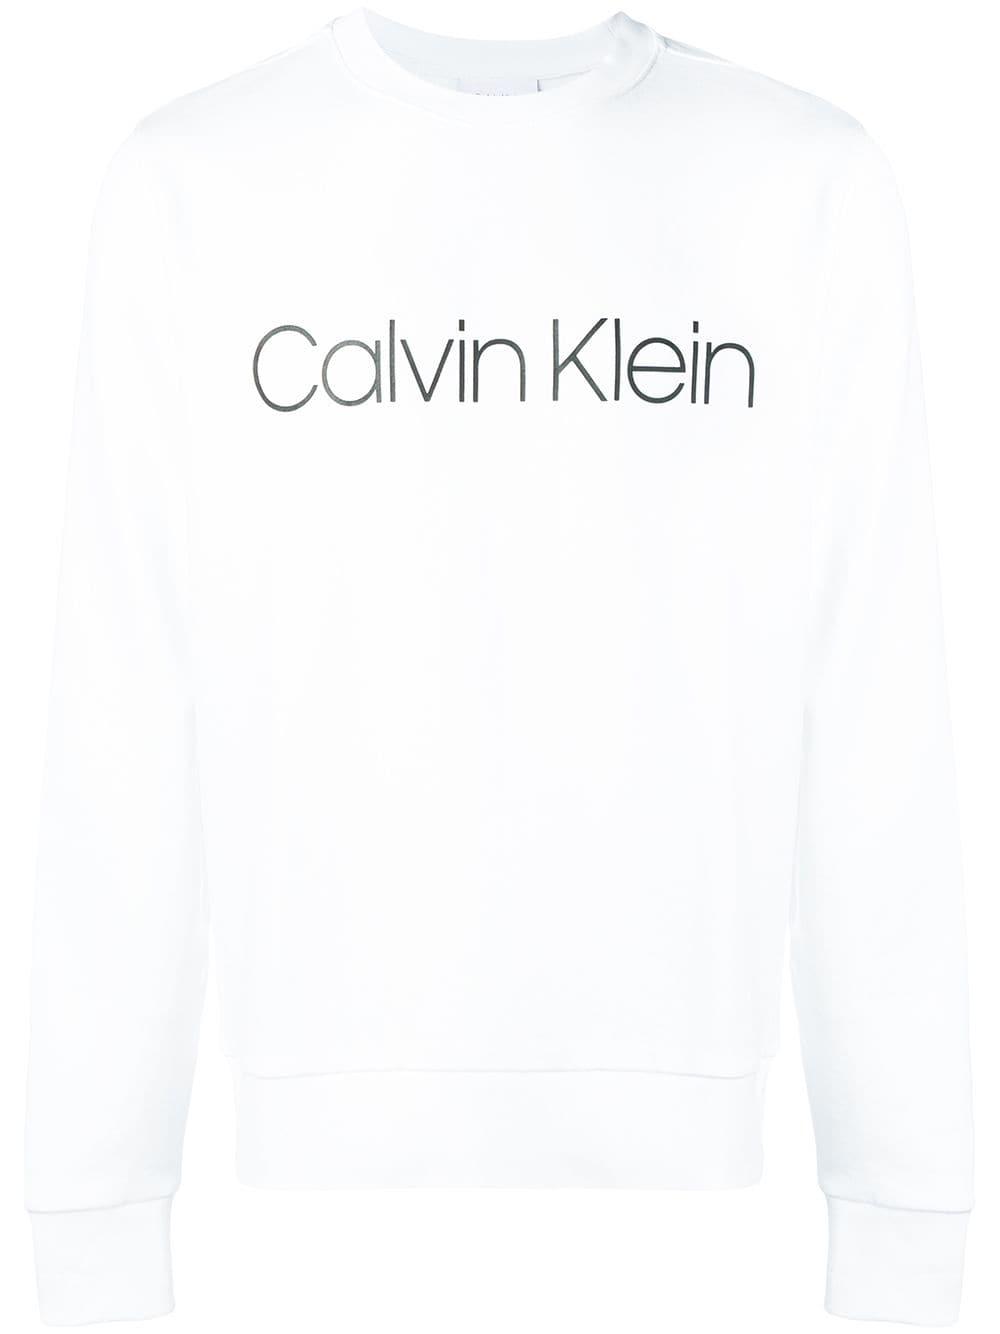 a875660968bbd ... Klein толстовка с принтом логотипа. -36%. Calvin ...